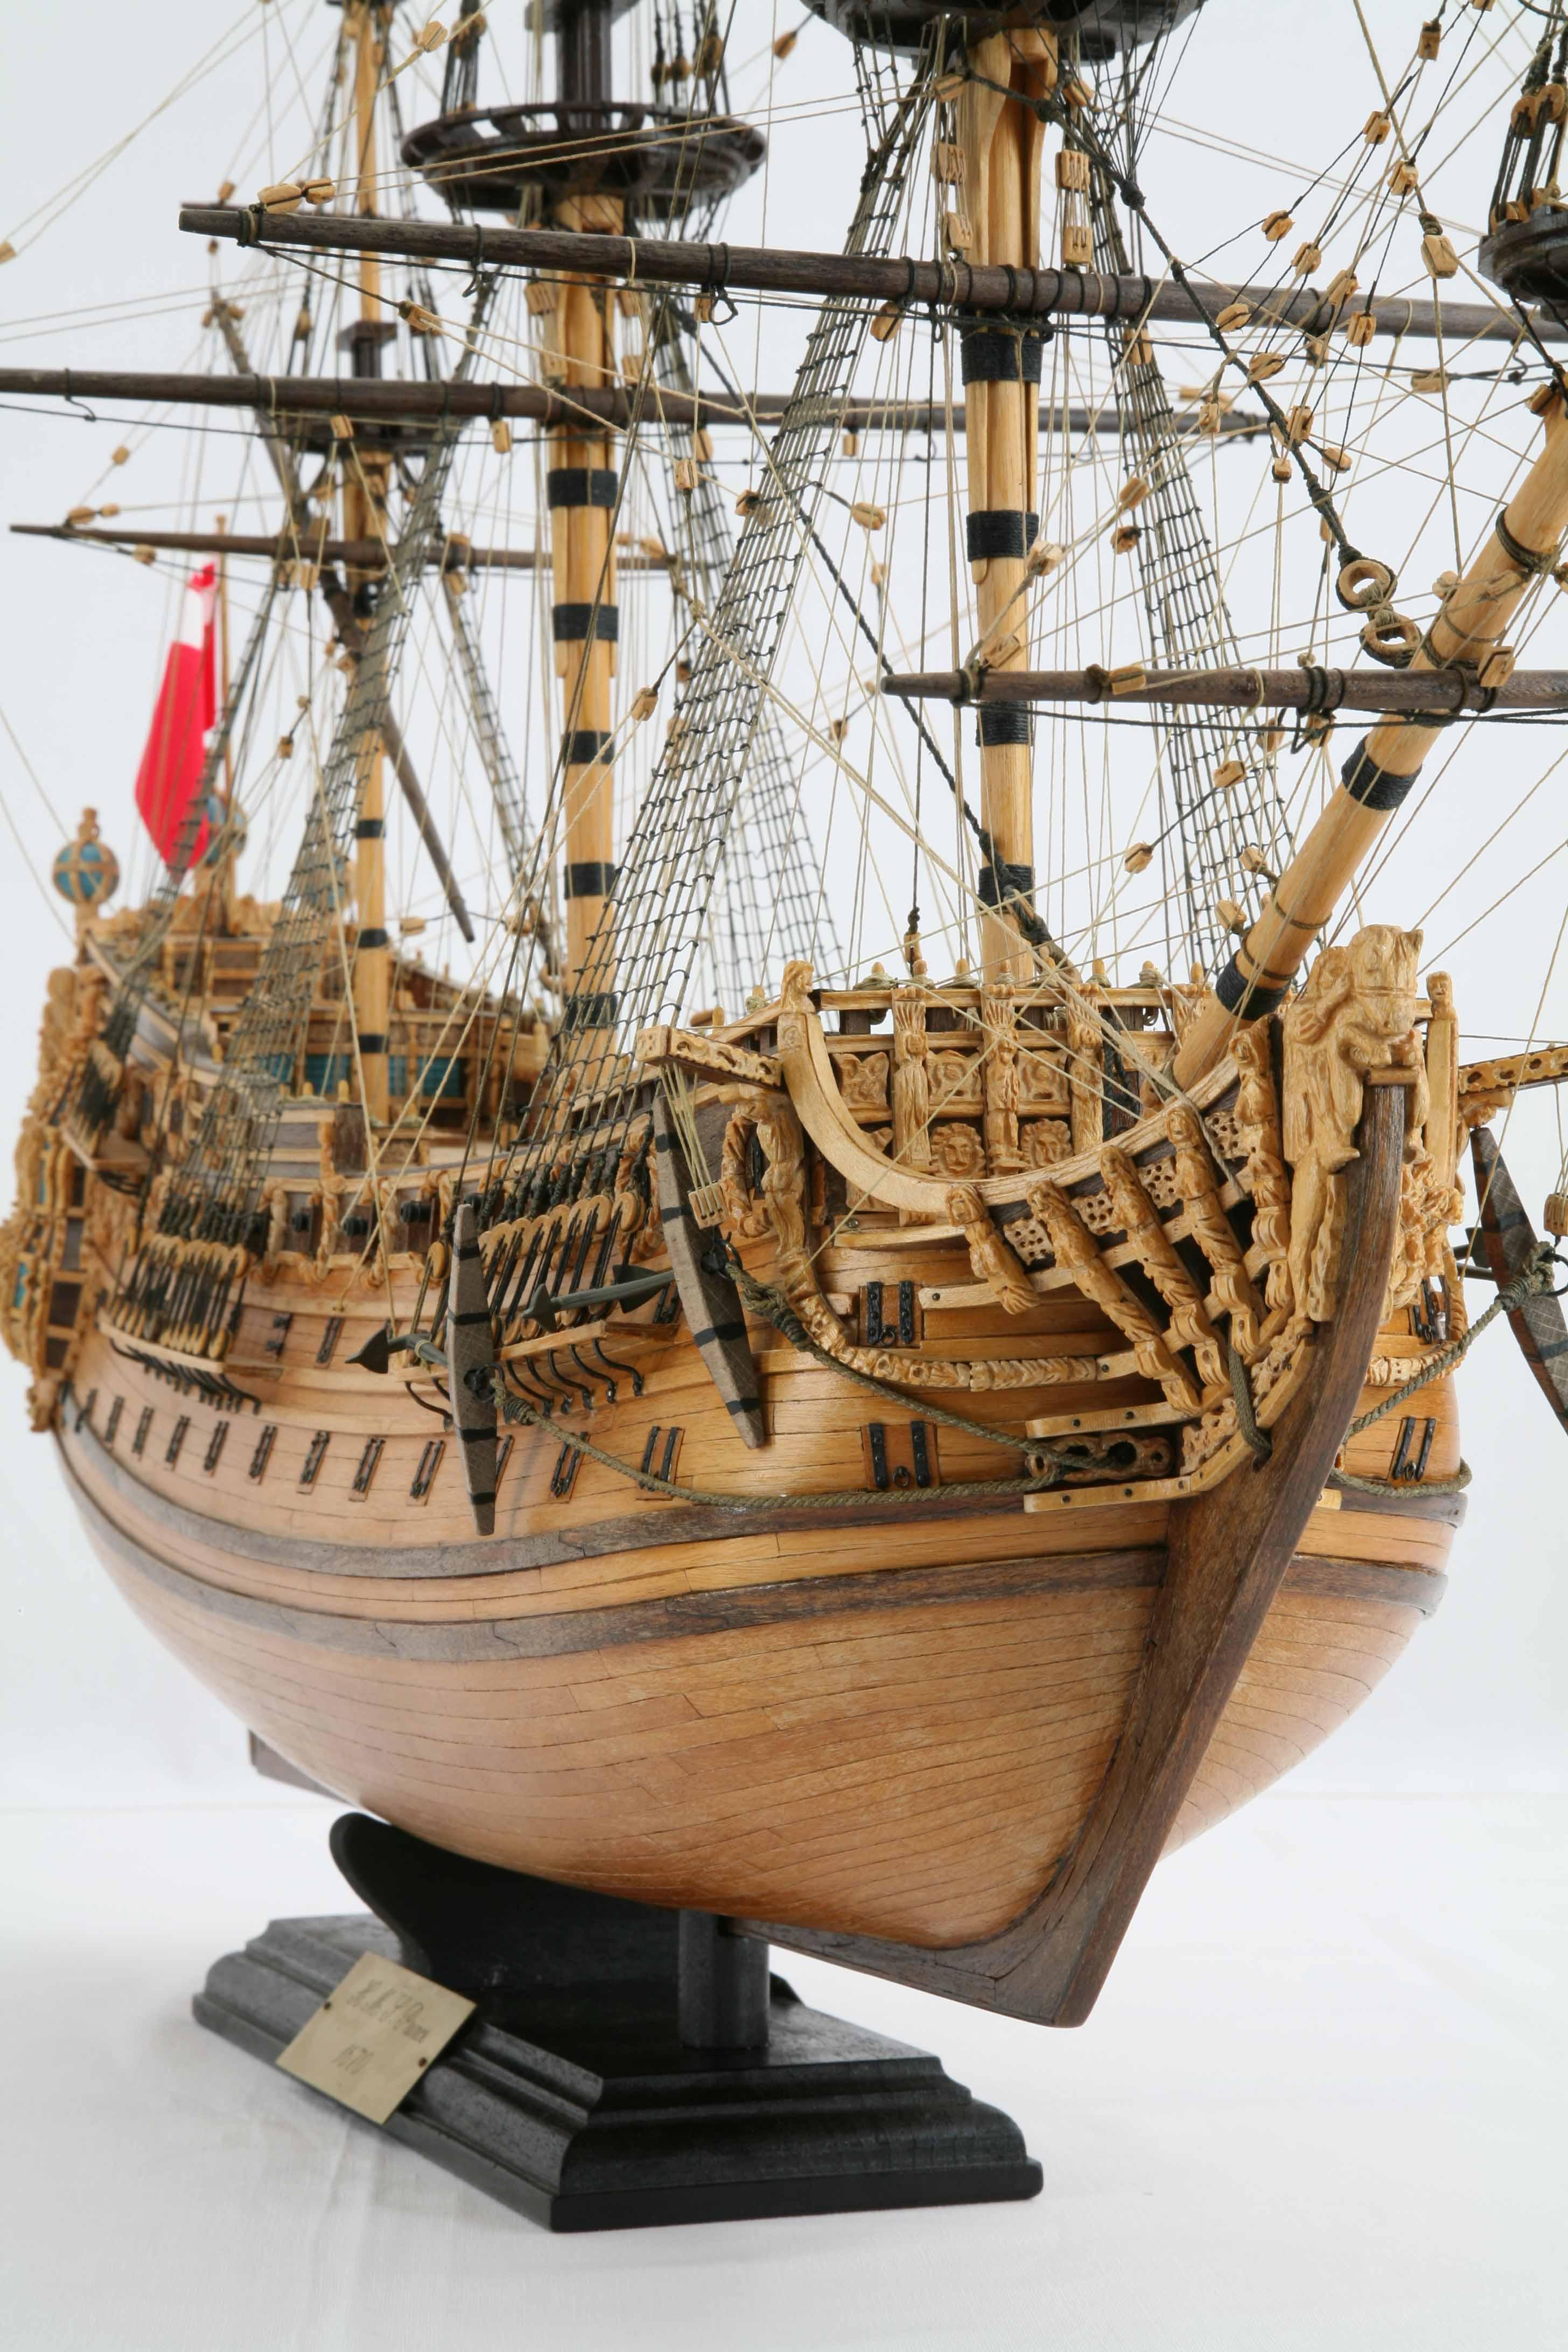 Close-up photos of ship model H.M.S. Prince of 1670